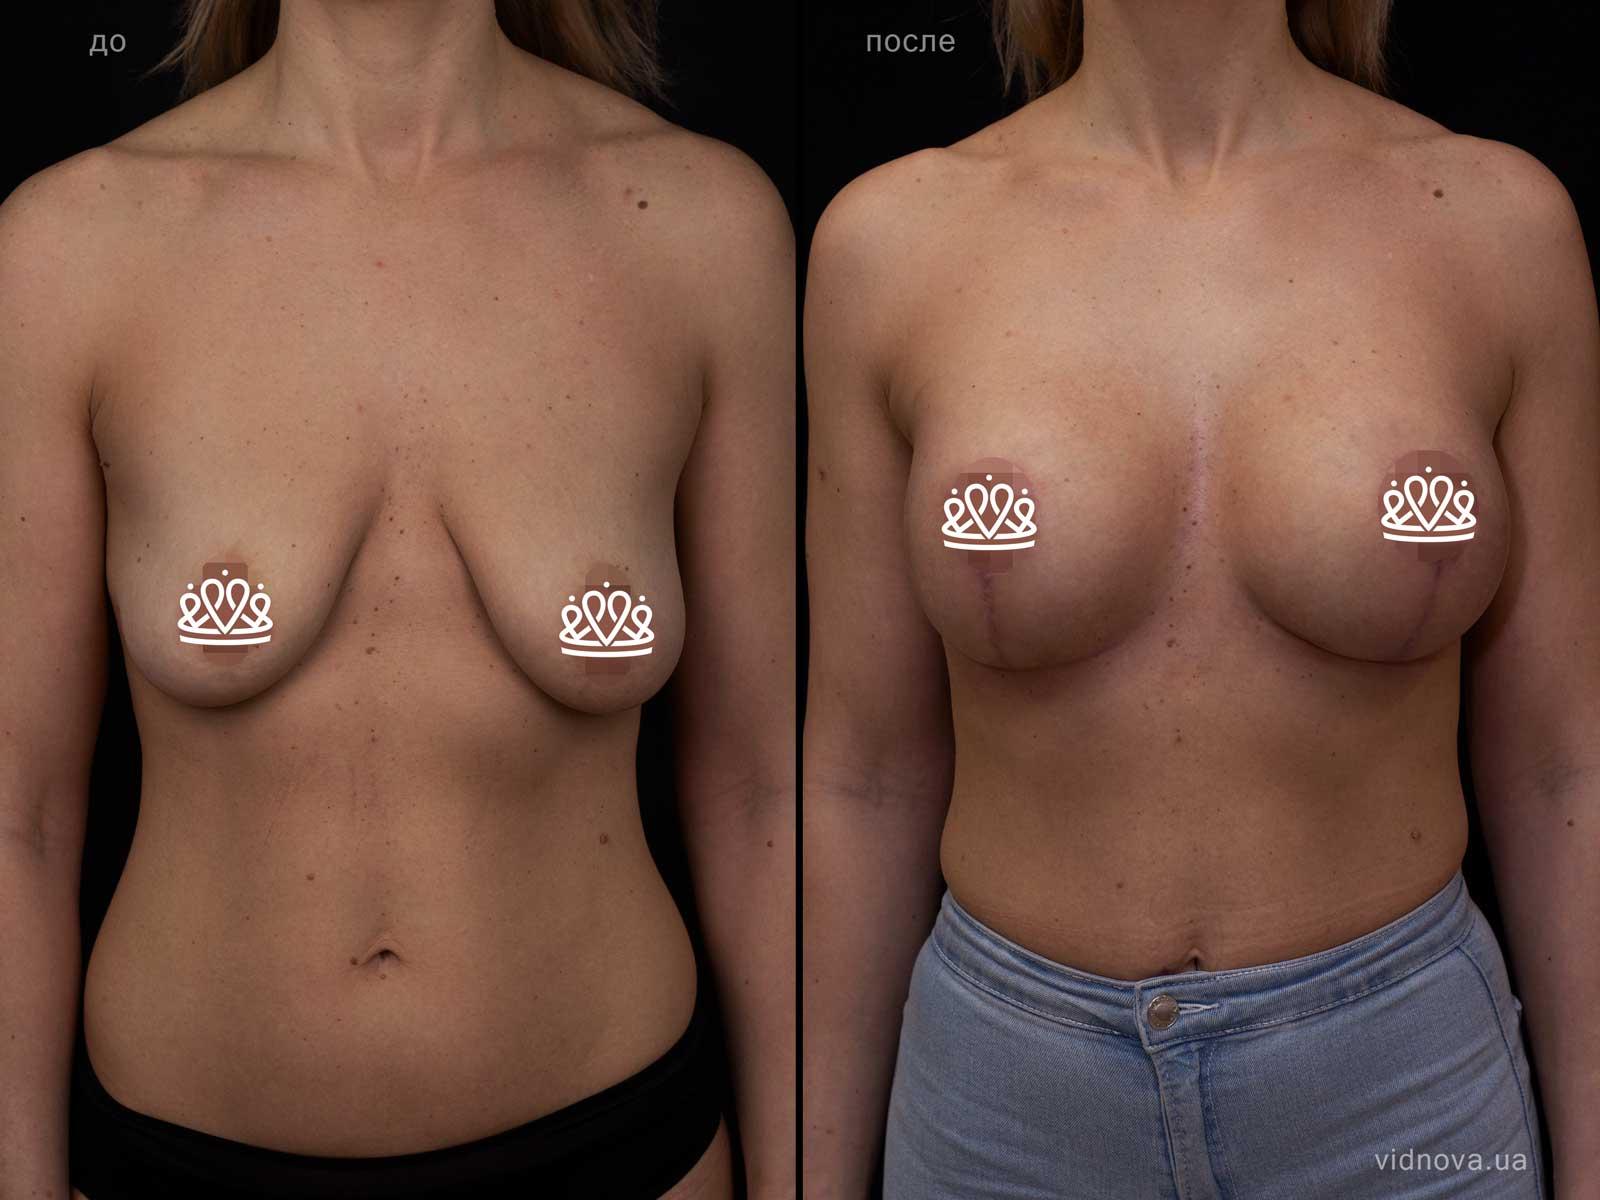 Коррекция асимметрии груди 1s 17